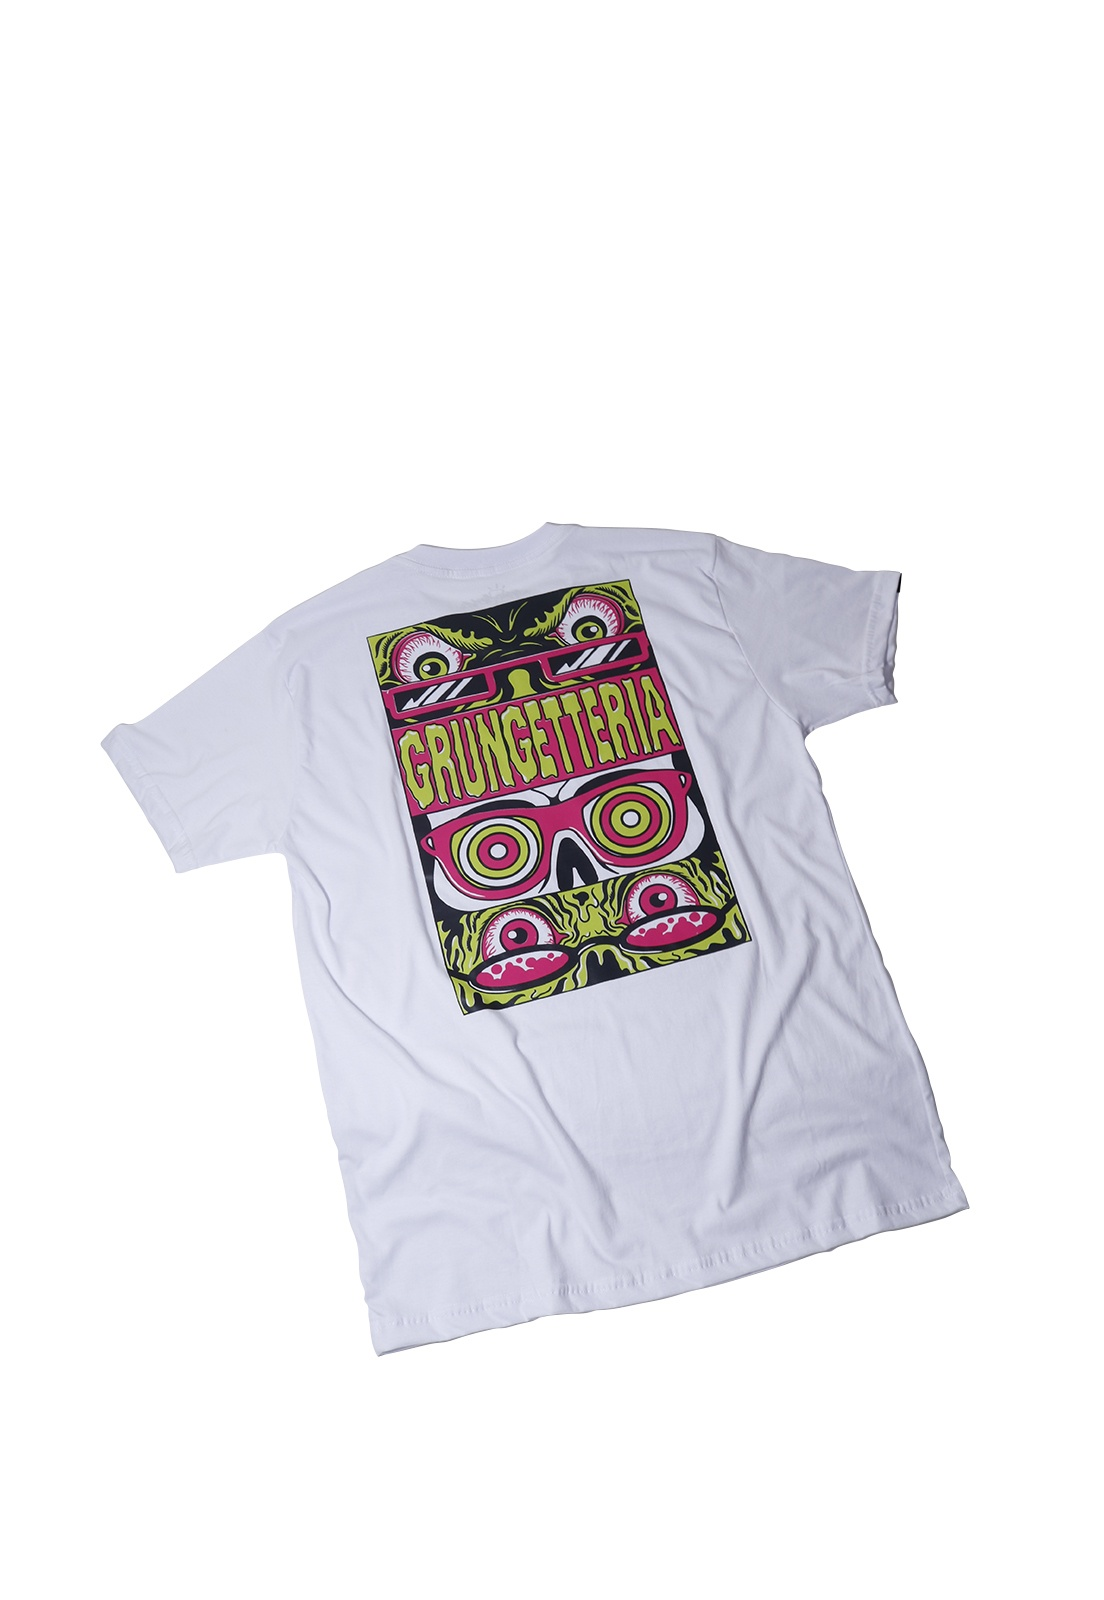 Camiseta Grungetteria Grunge Eyes Branca